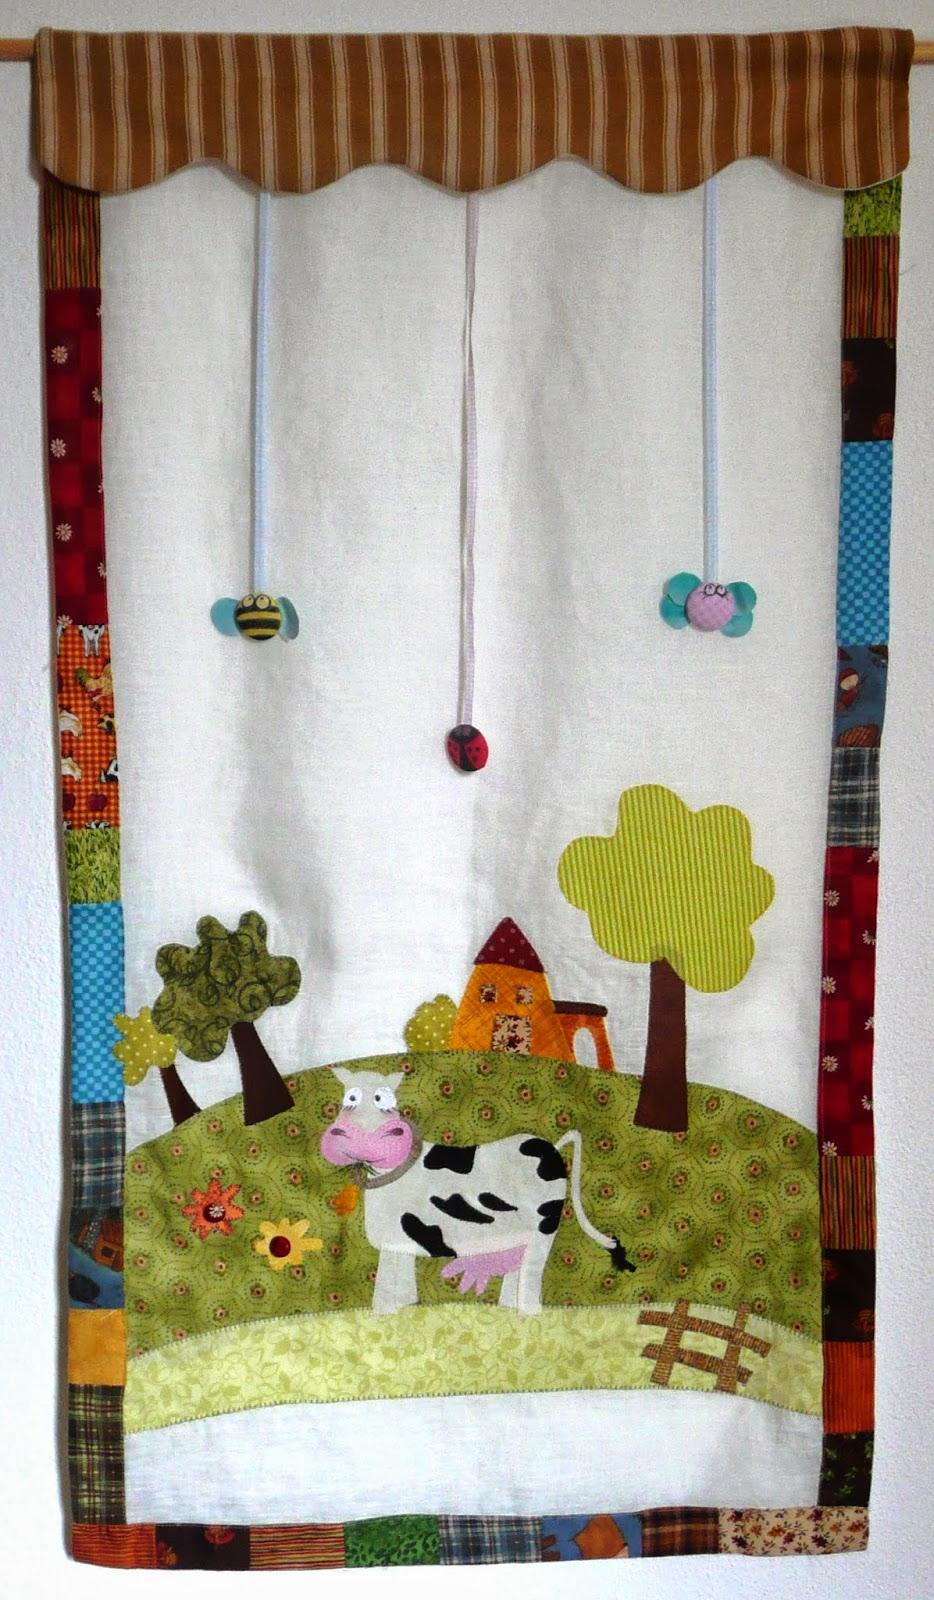 Il patchwork veste casa tende patchwork linea bimbi for Applique cameretta bimbi